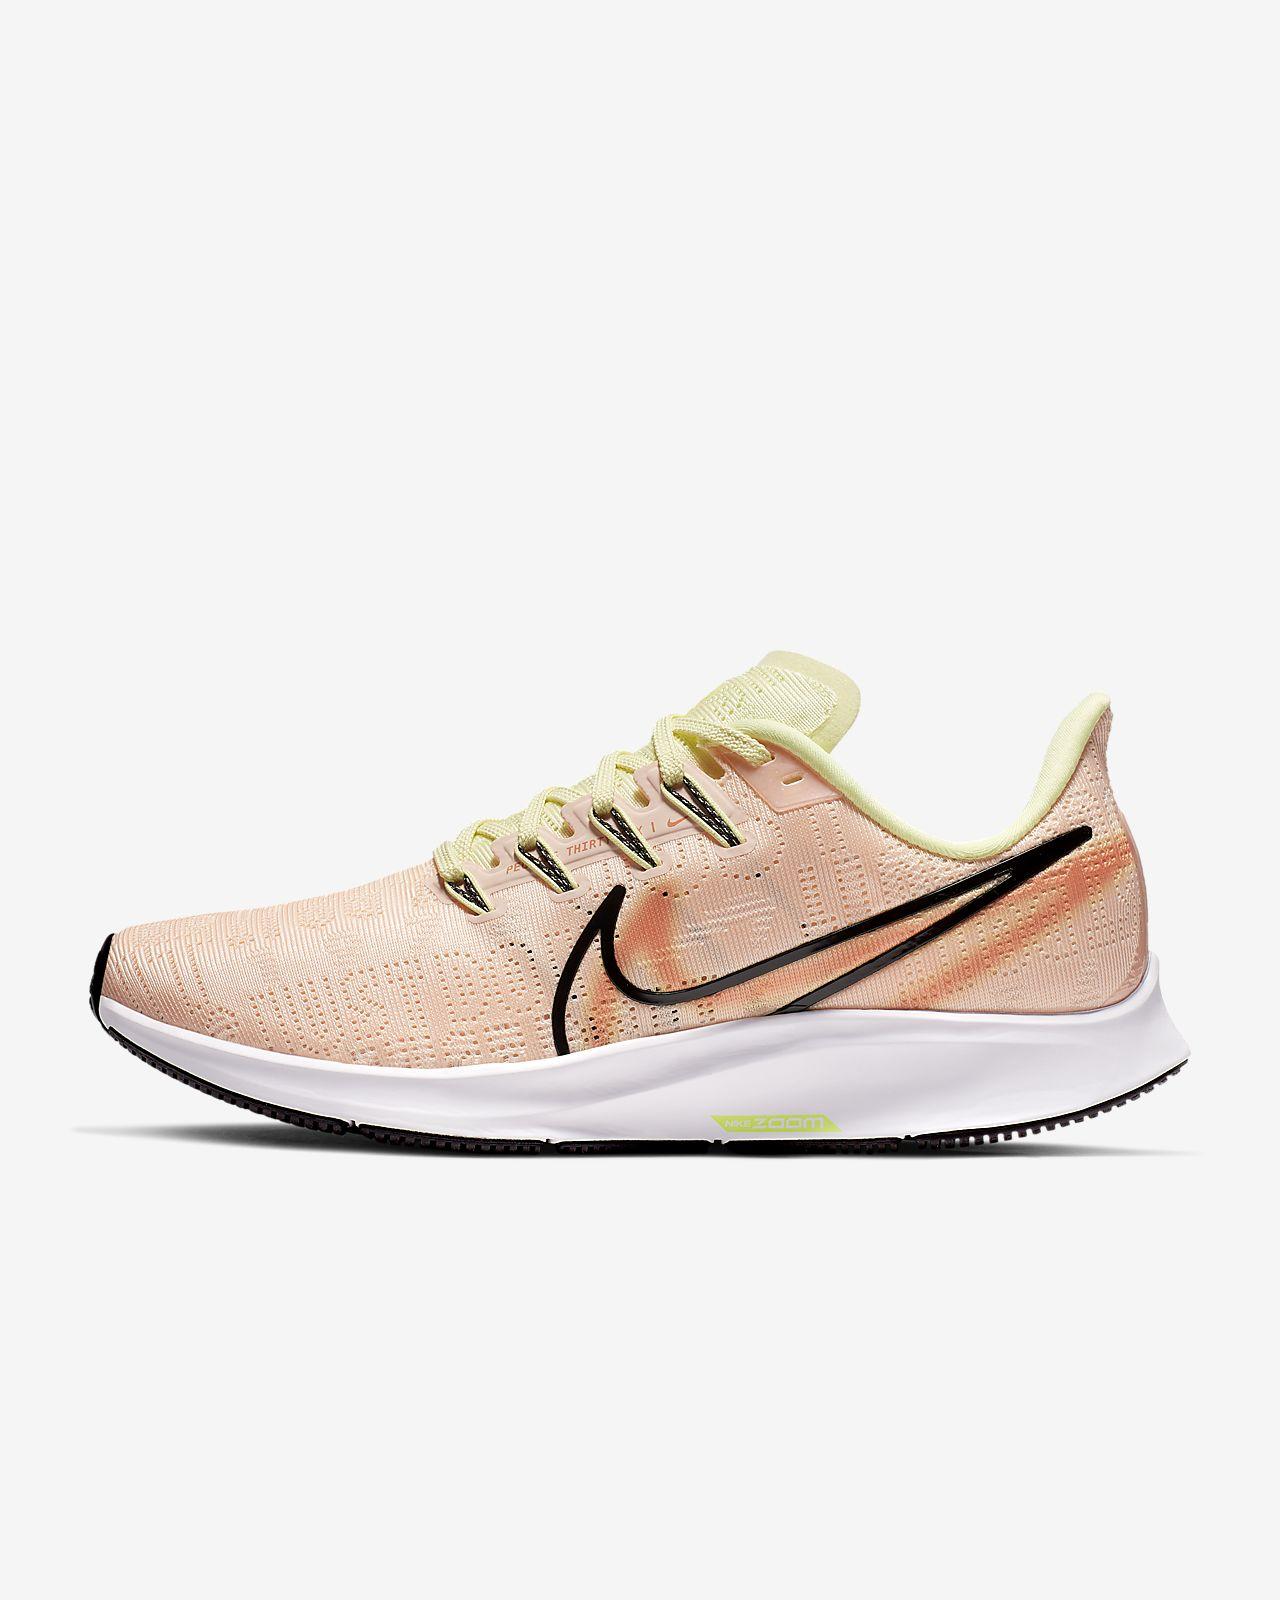 Chaussure de running Nike Air Zoom Pegasus 36 Premium Rise pour Femme